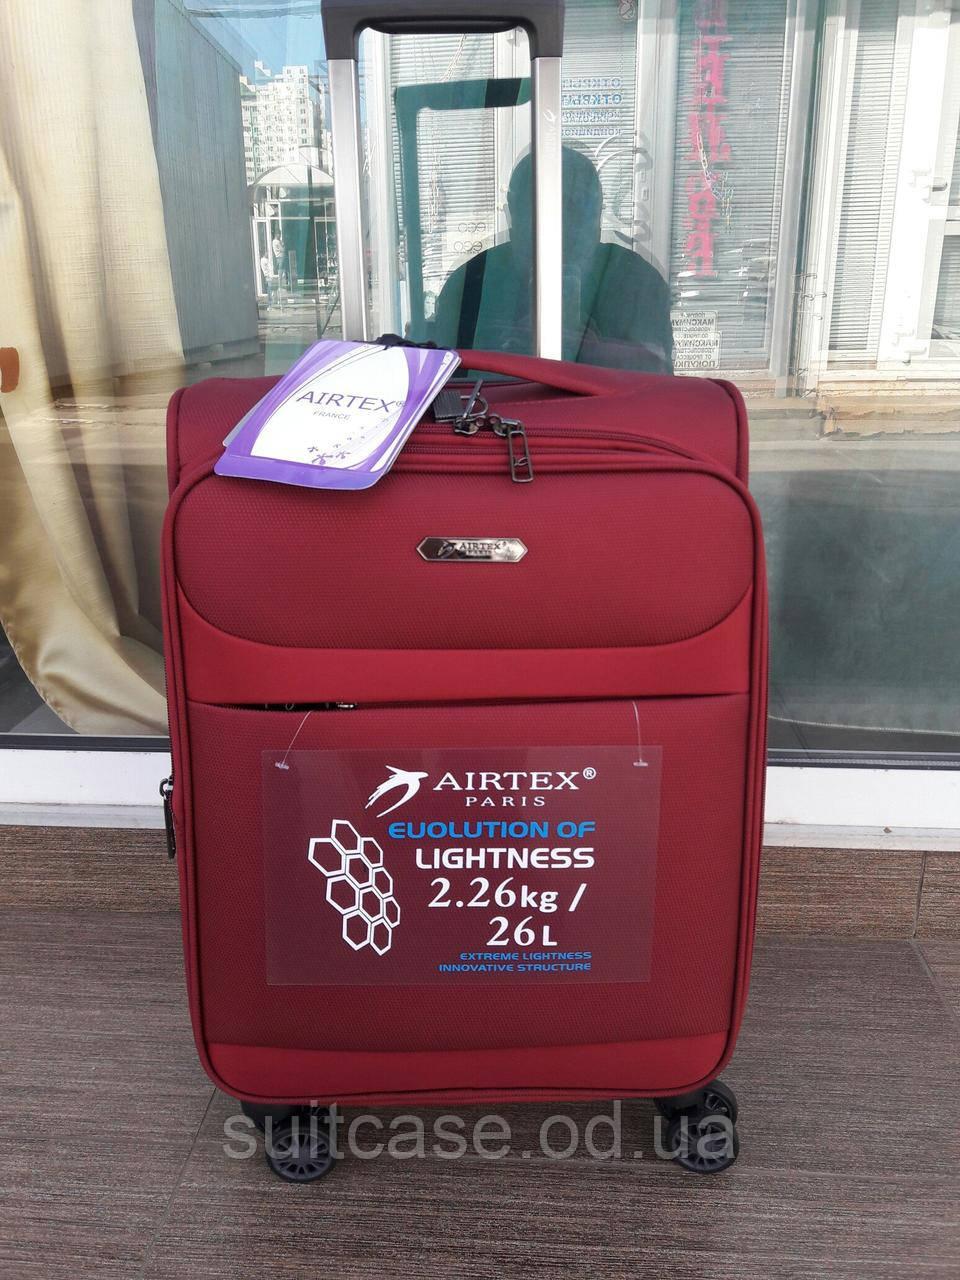 Ультра легкий тканевый чемодан под ручную кладь на 4-х кол. Airtex 822, 30f2730658d